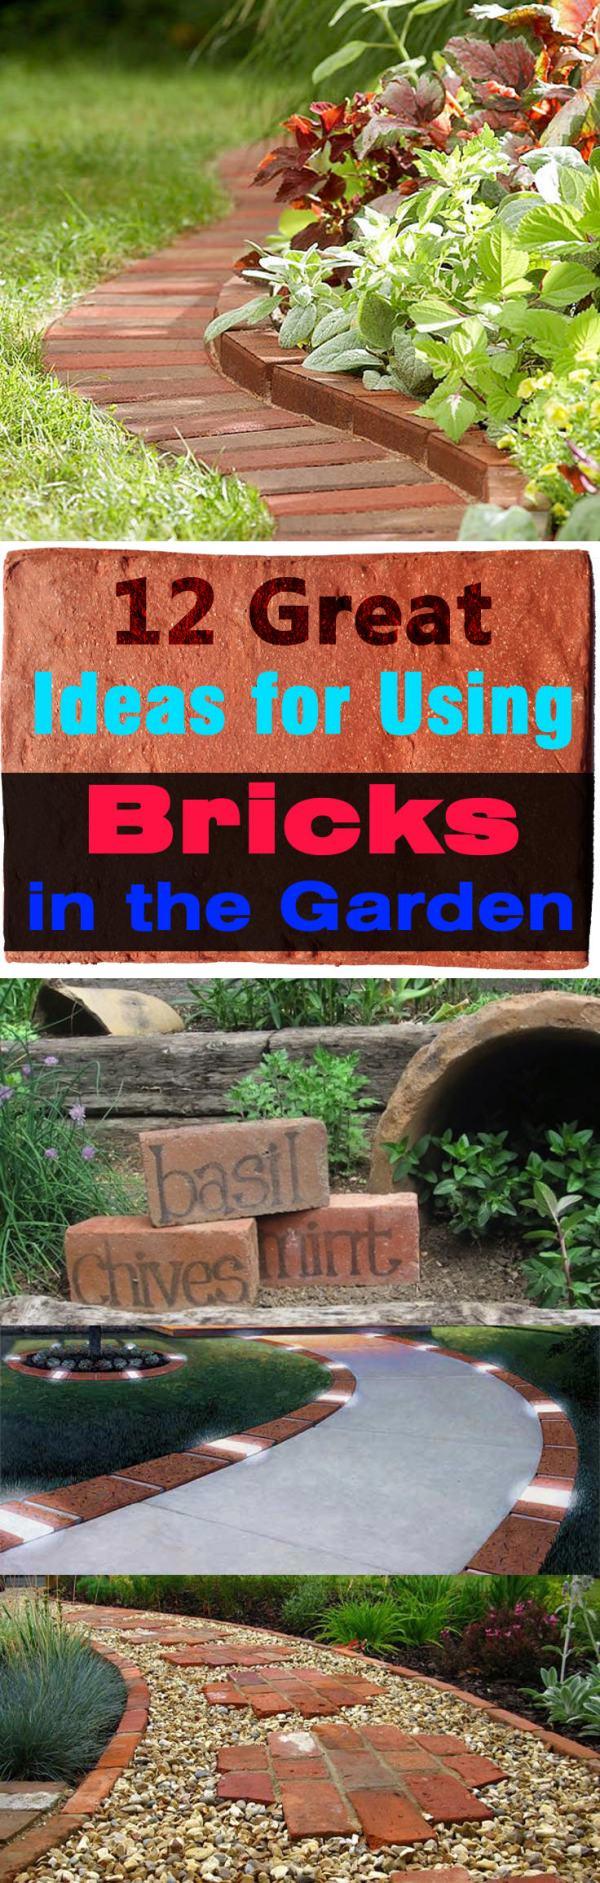 bricks in garden smart